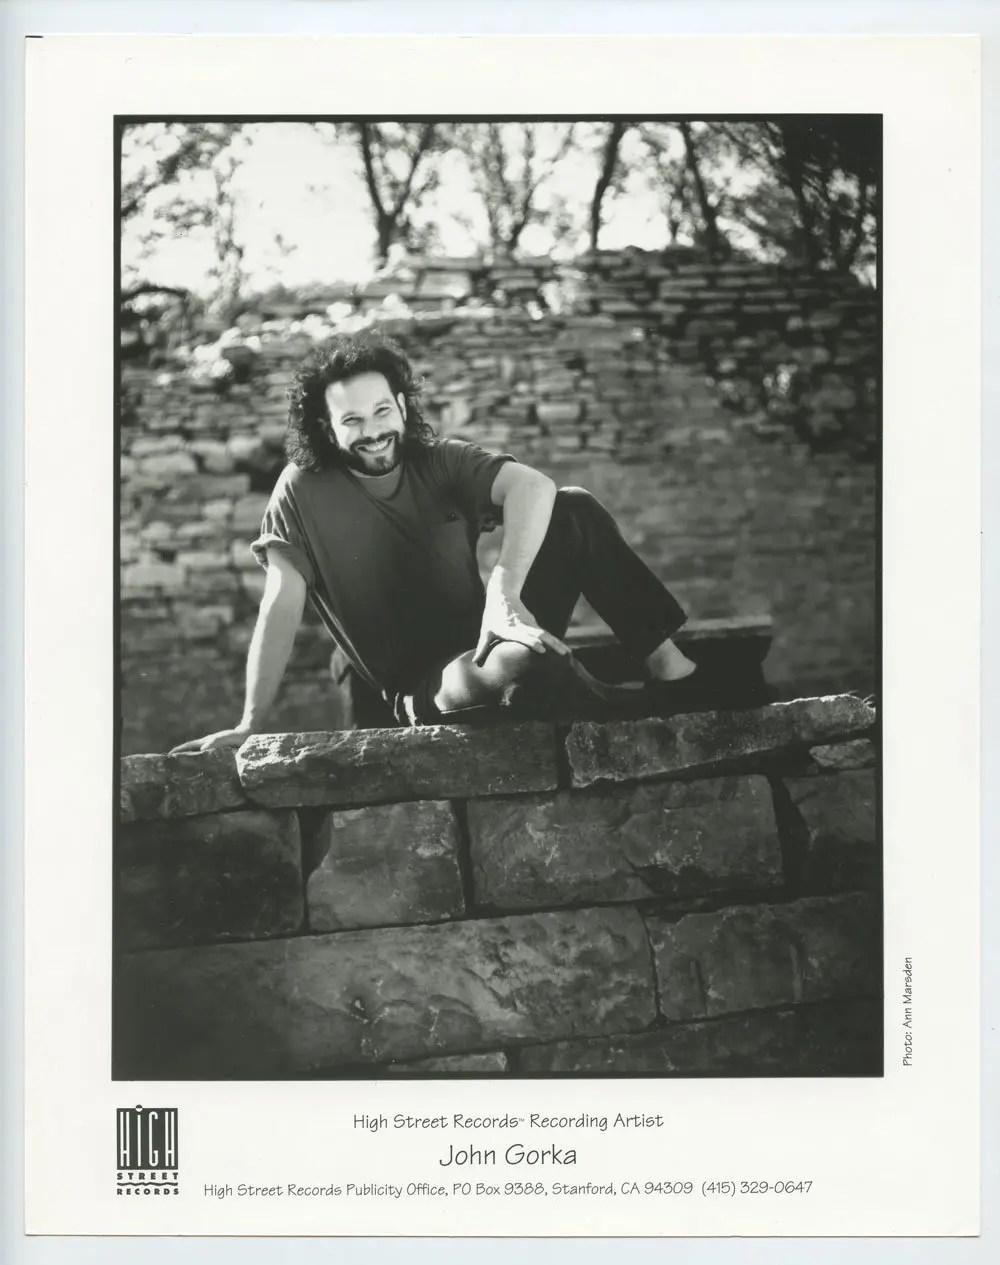 John Gorka Photo 1990s Publicity Promo Hill Street Records